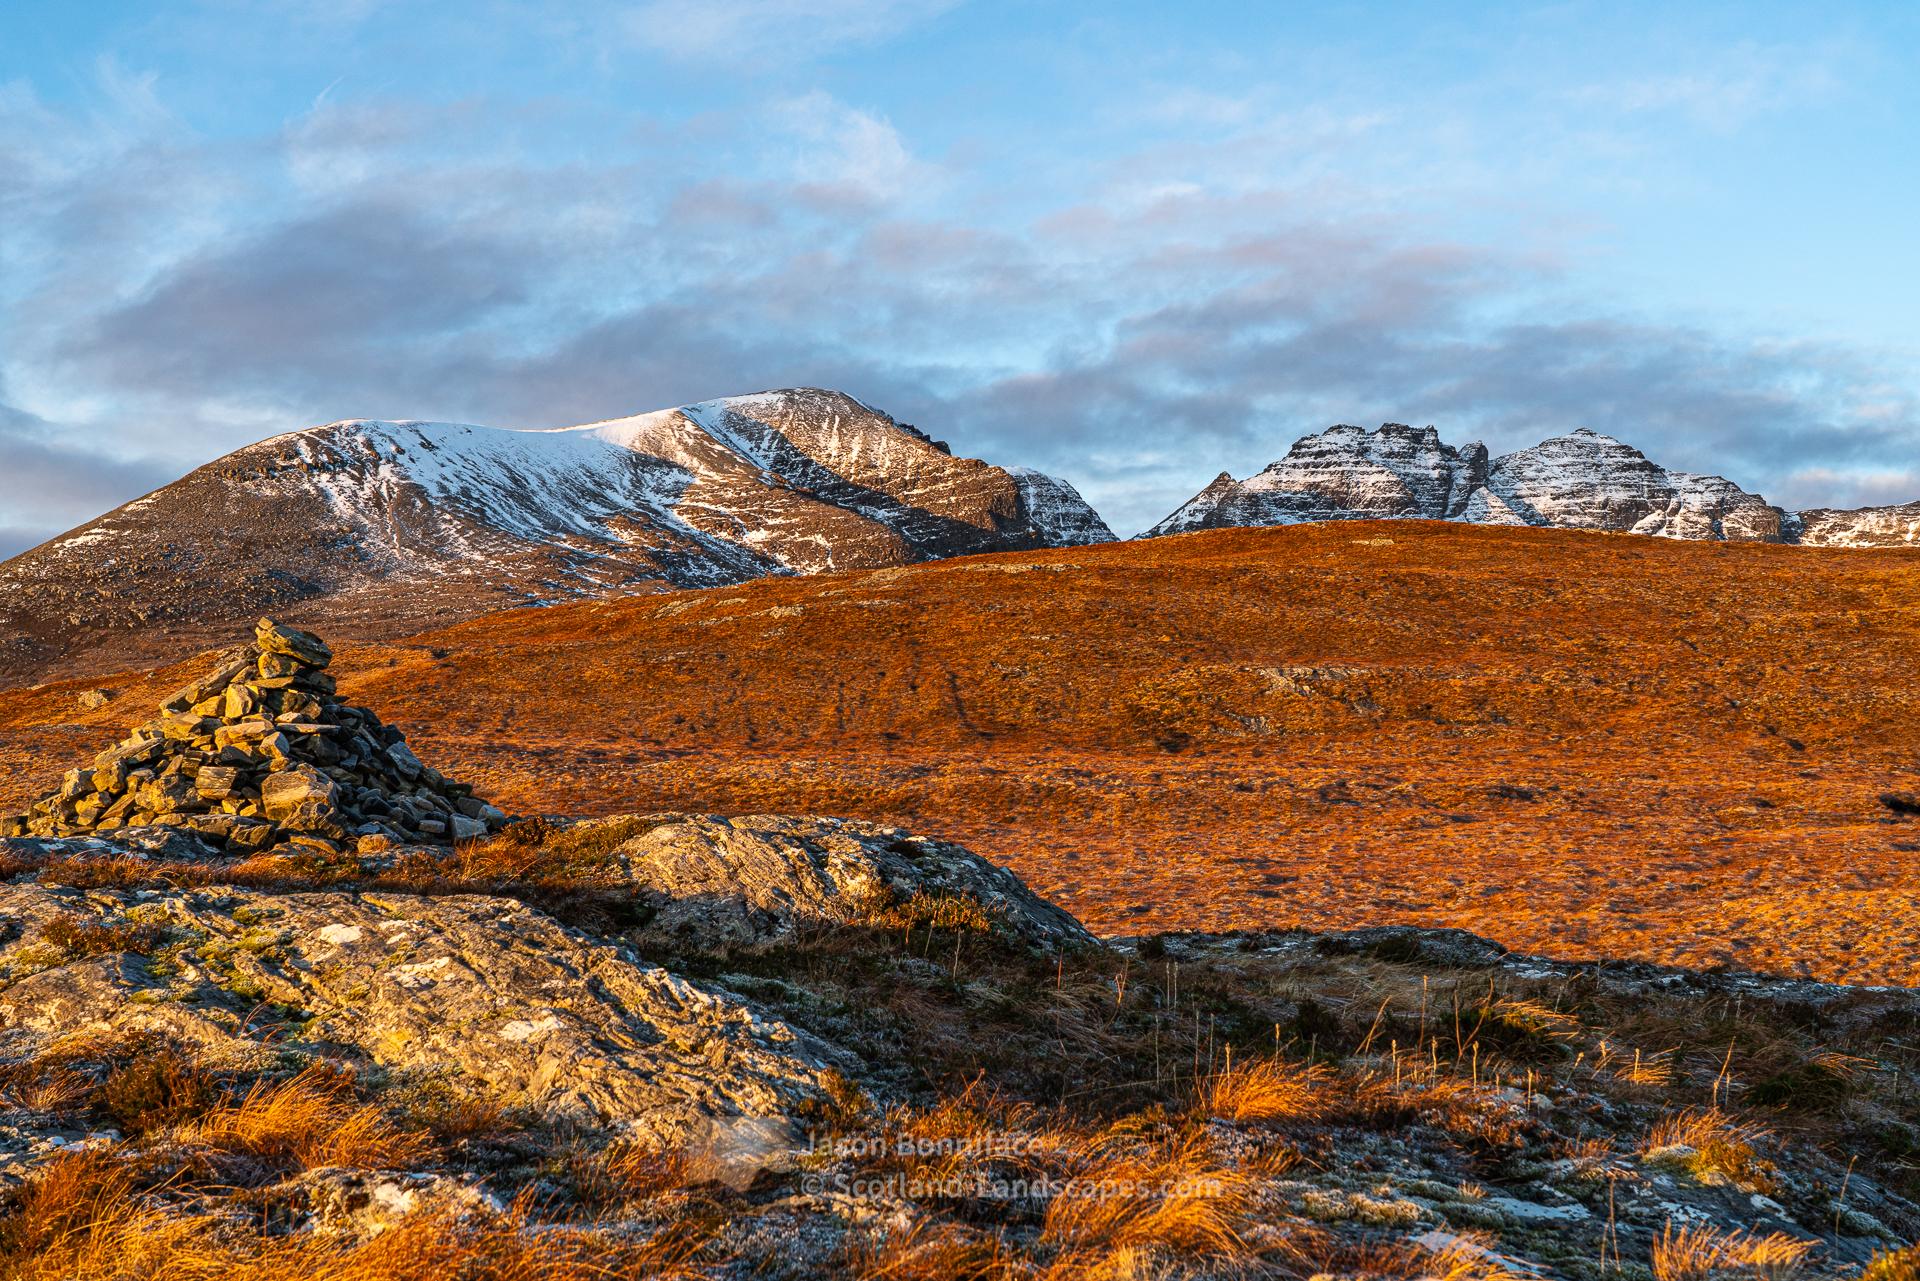 Morning sun on the Toll an Lochain peaks of An Teallach